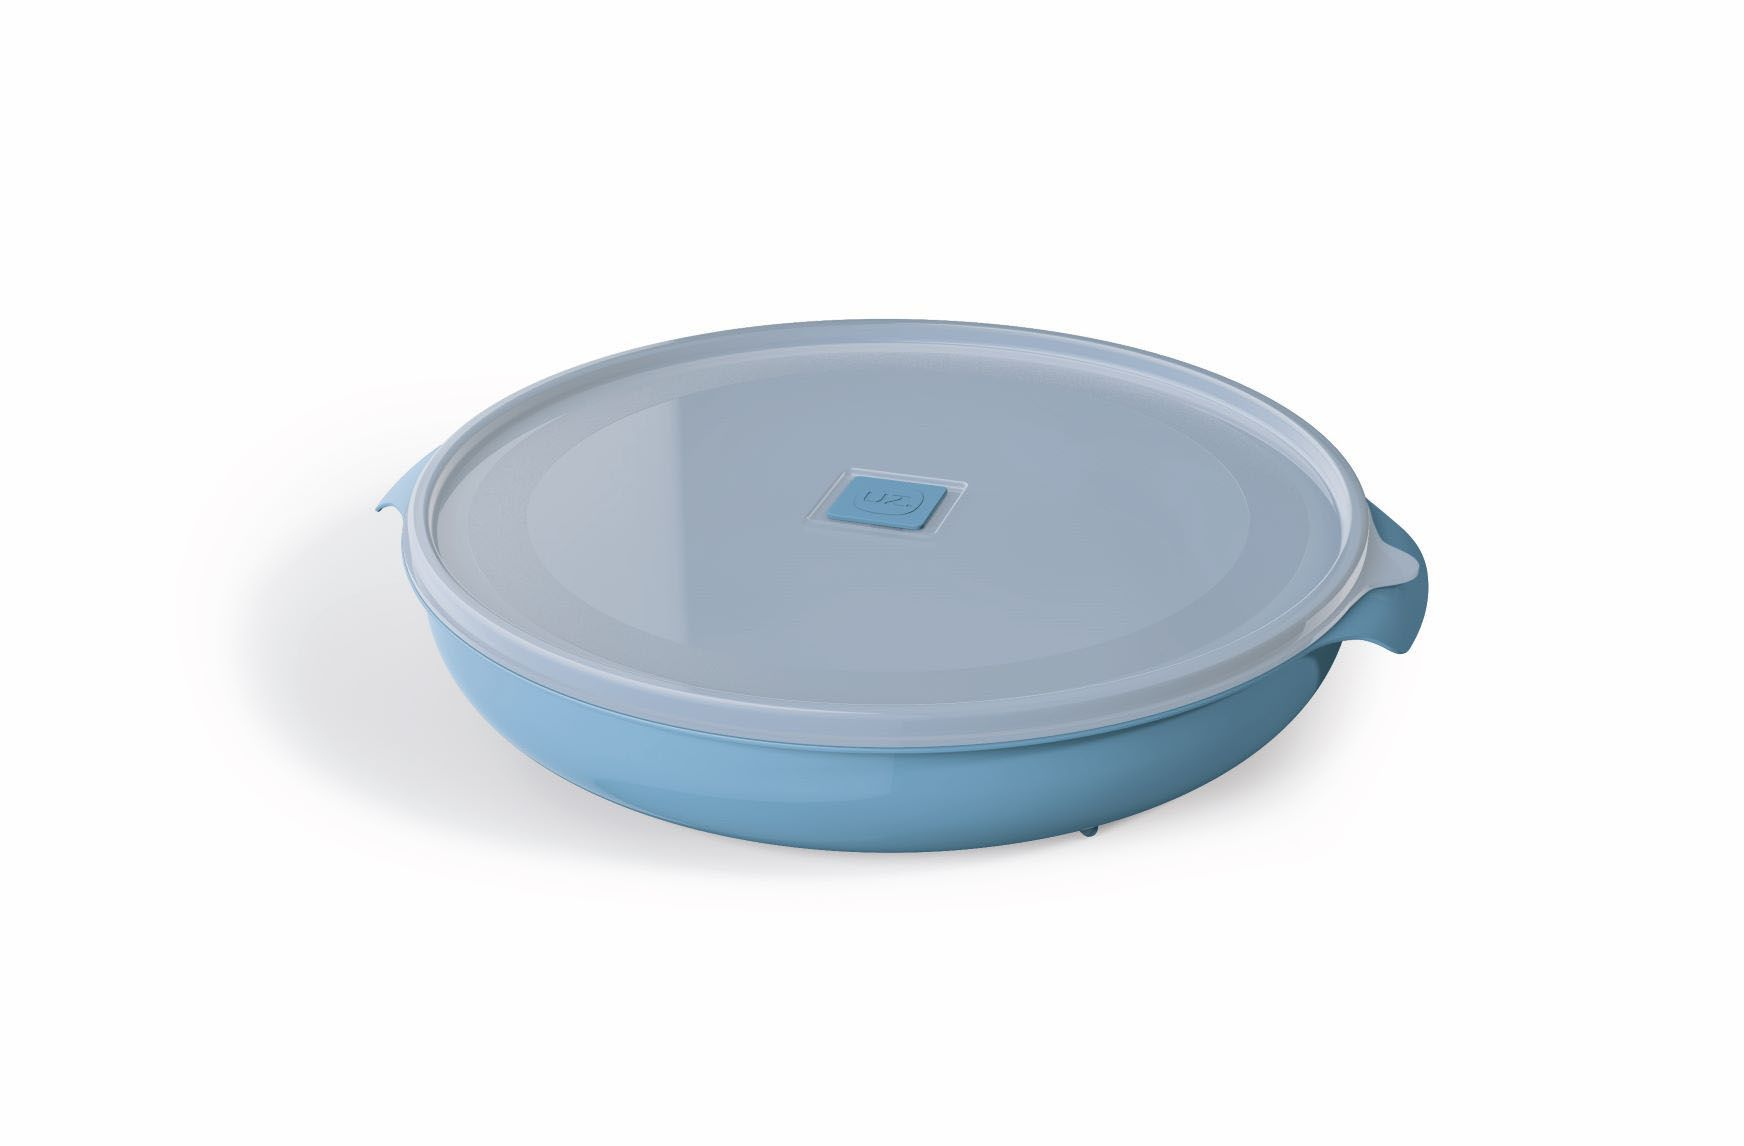 Pote Redondo 2,5 Litros Premium Tampa Transparente UZ  Azul